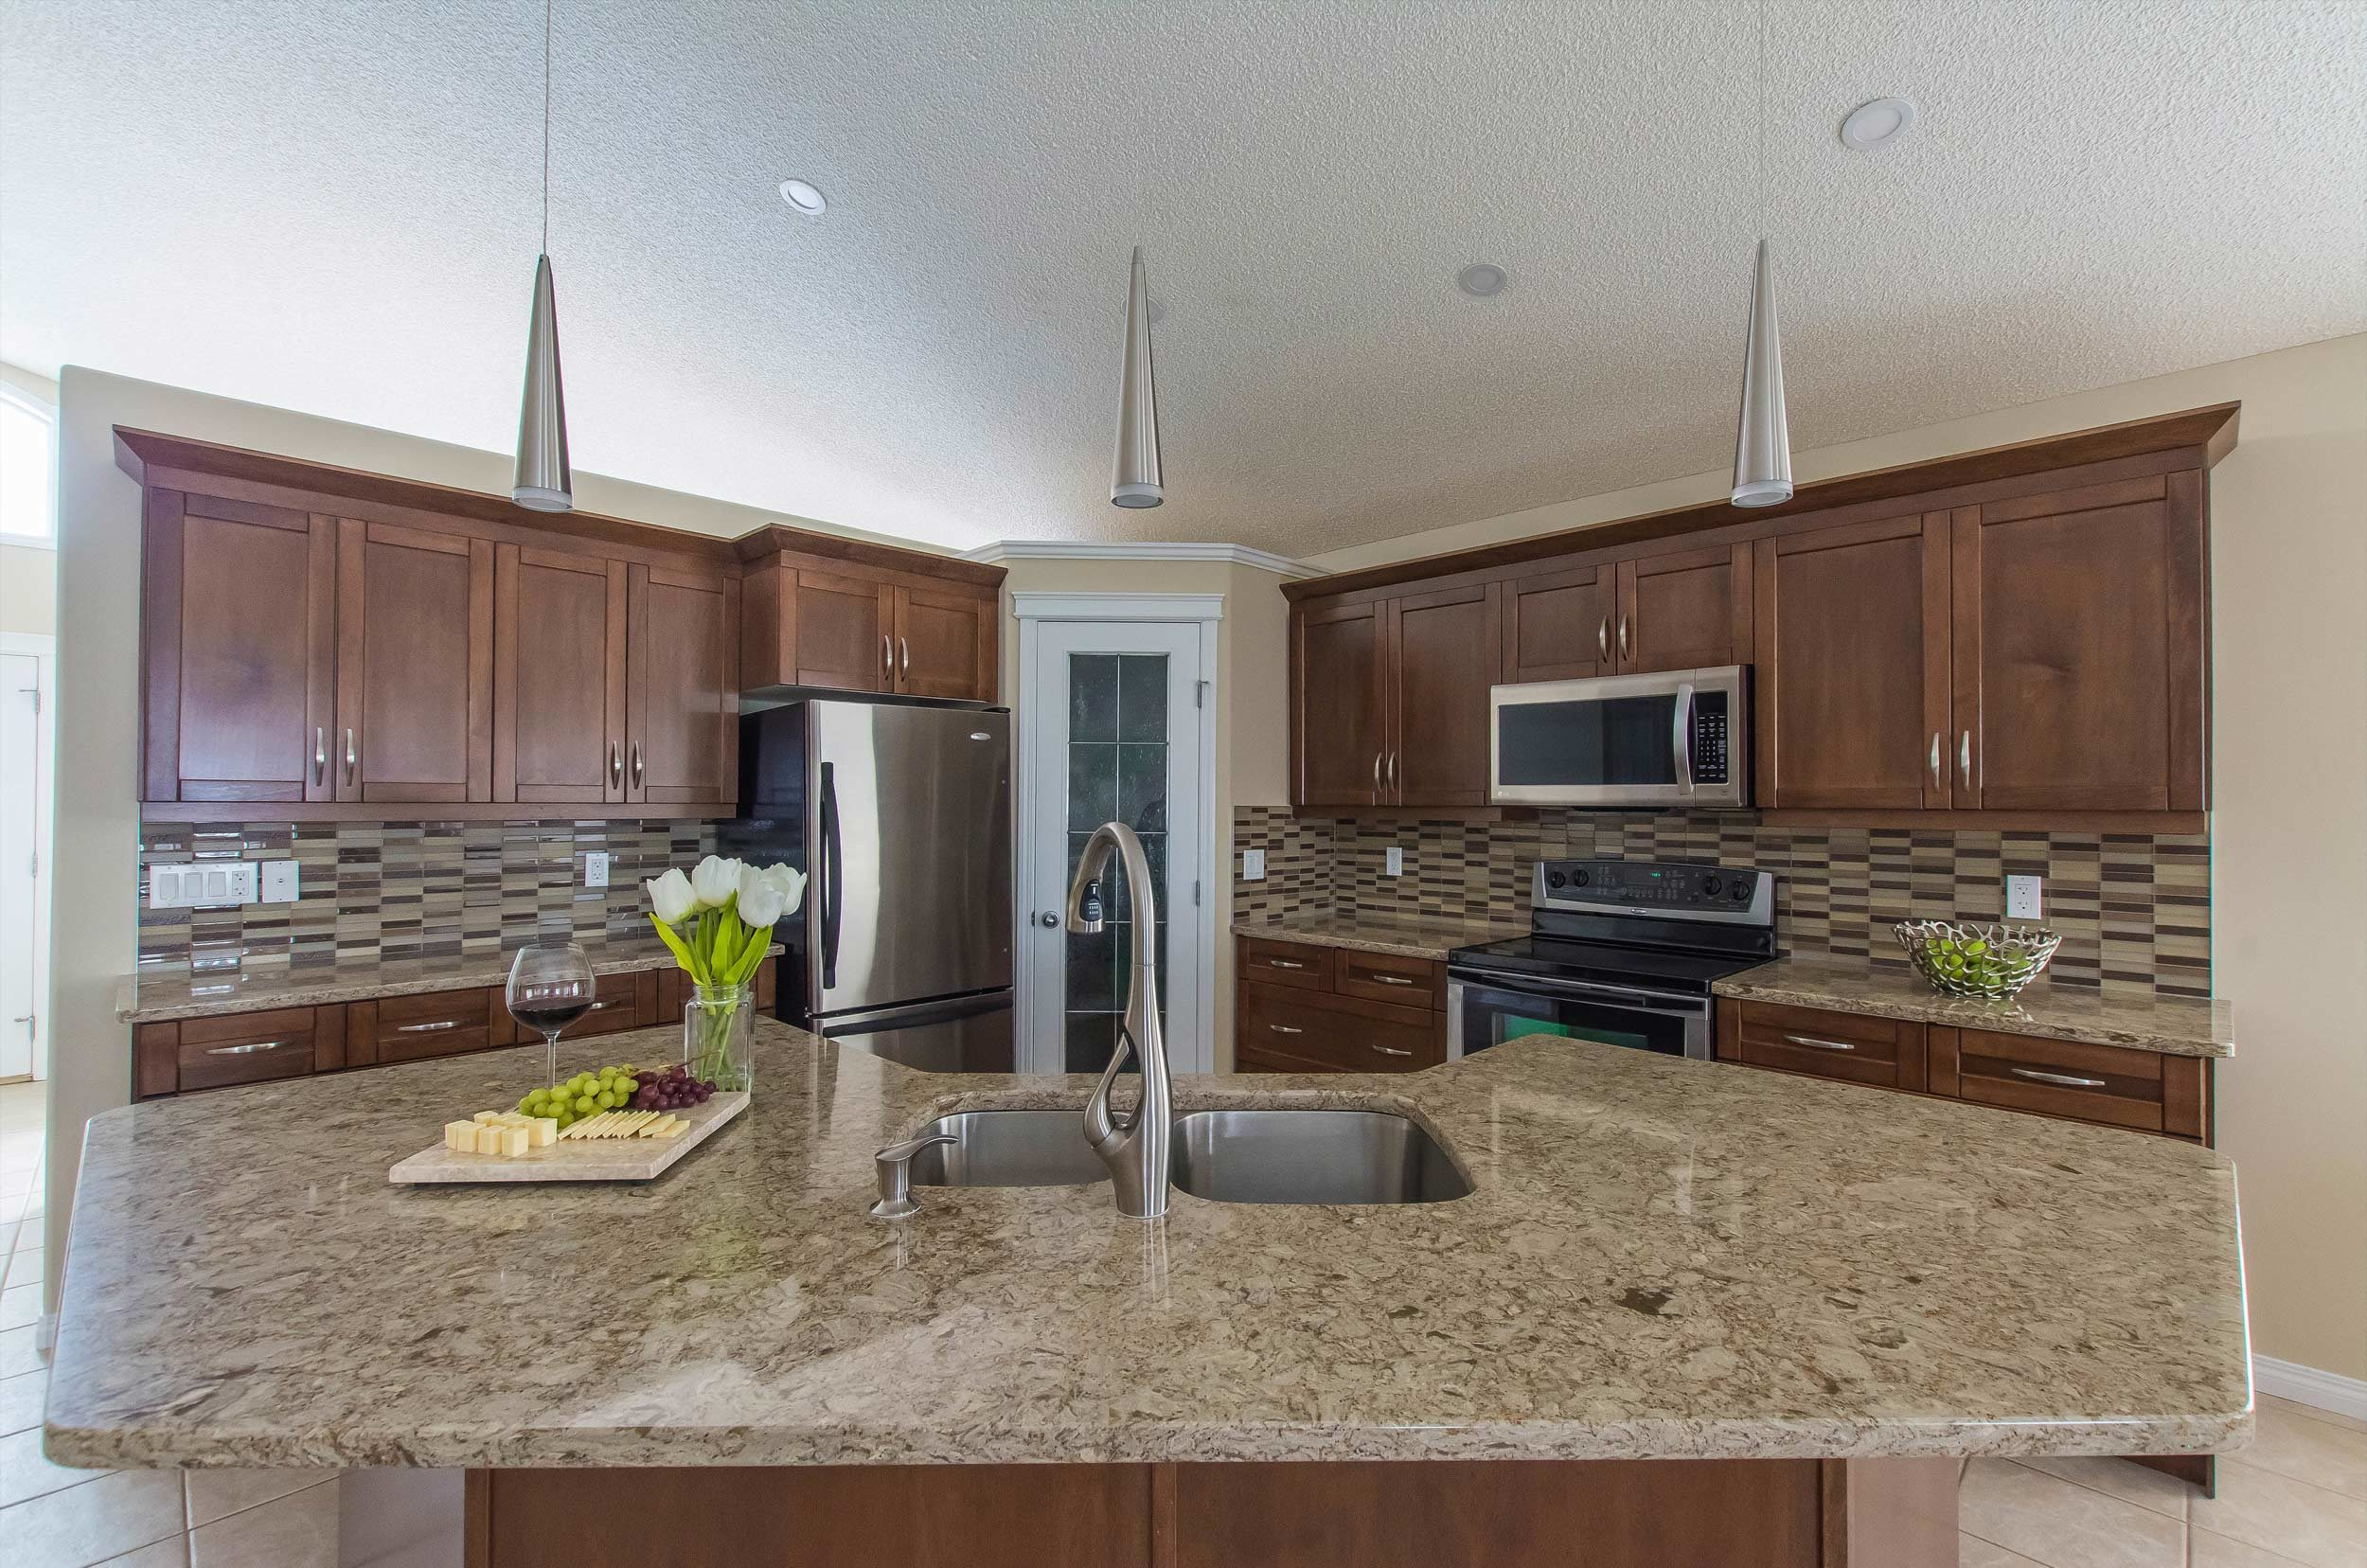 Kitchen Renovation- Distinct Interior Design